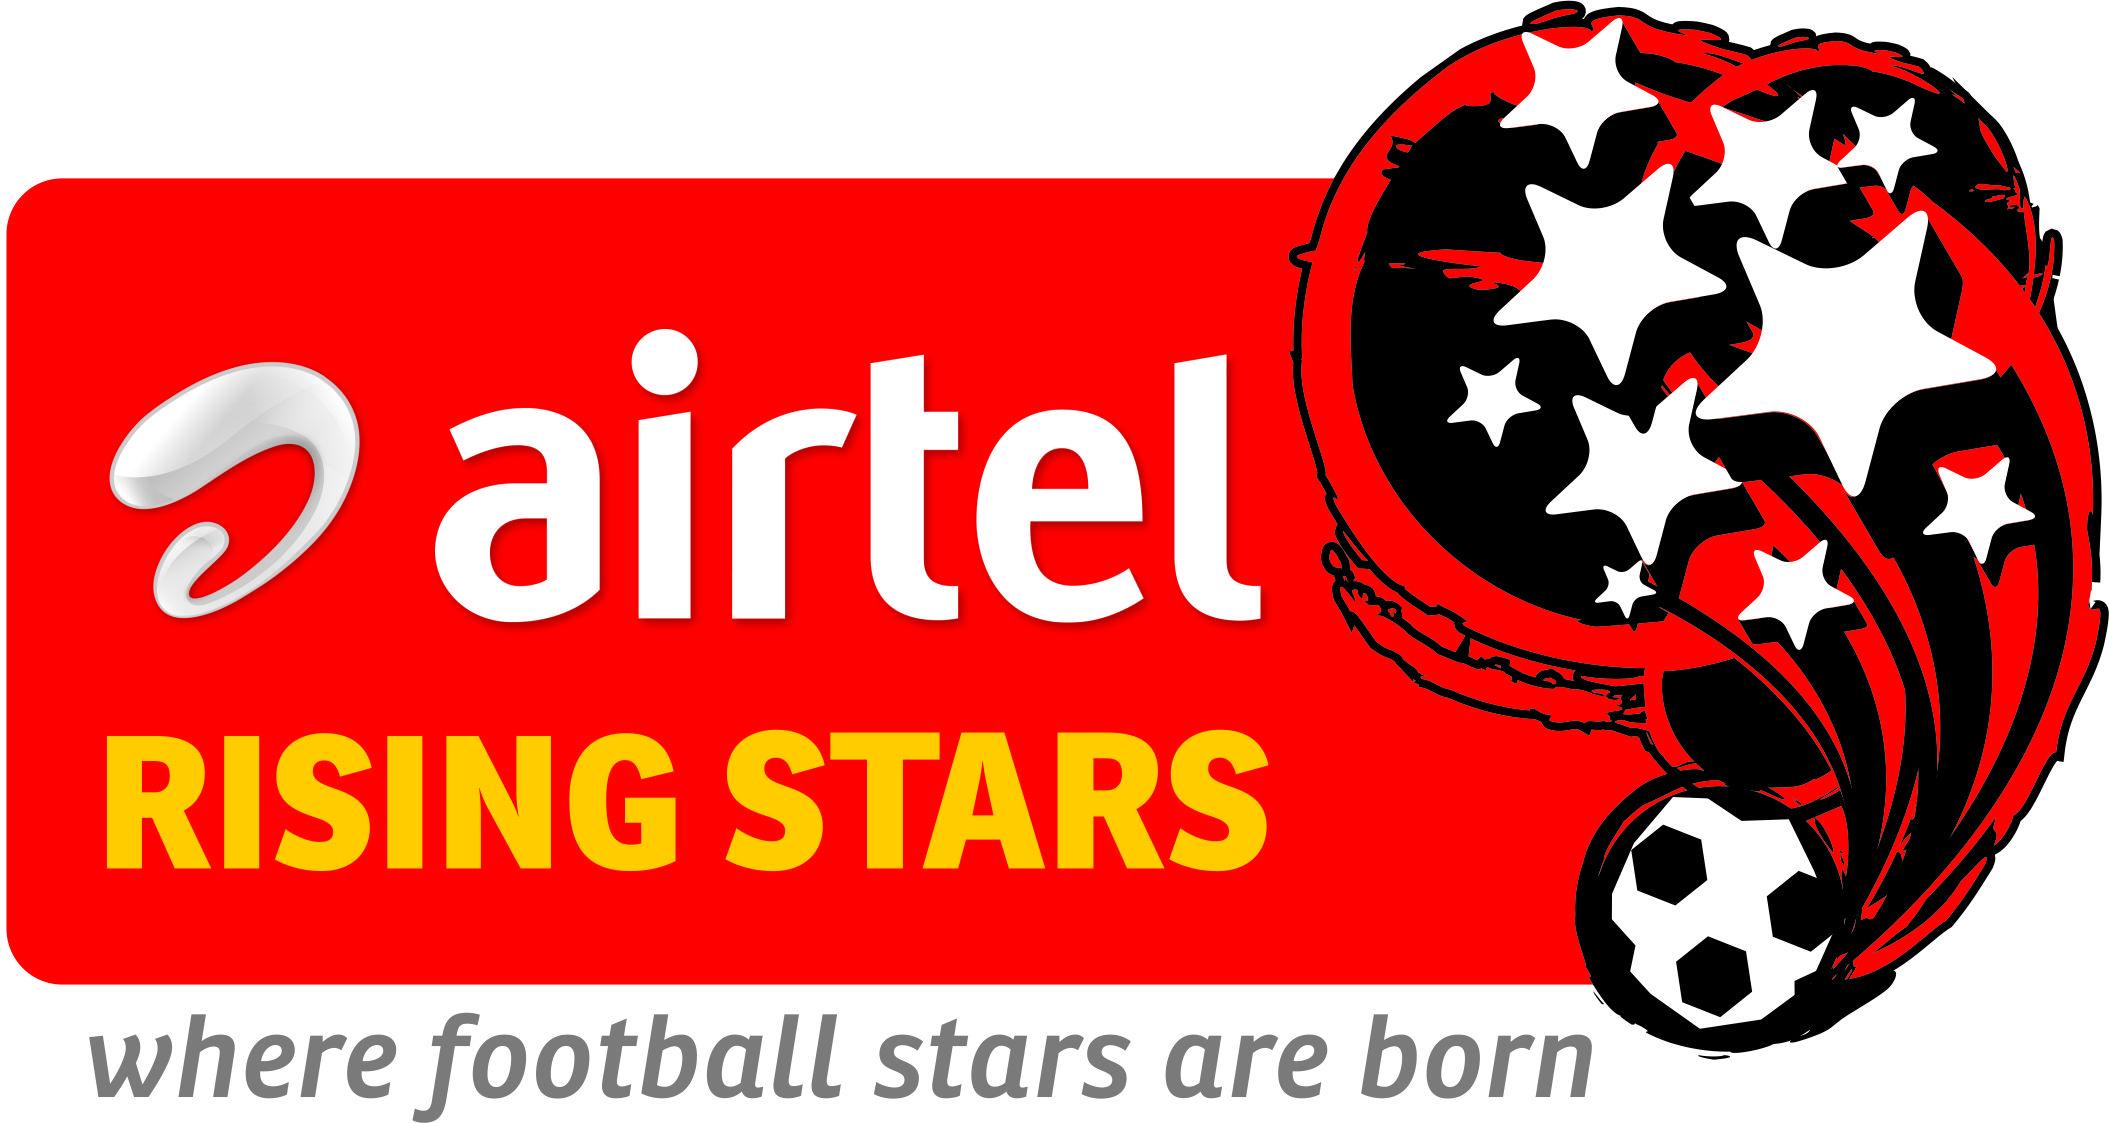 Airtel Rising Stars 2013-14